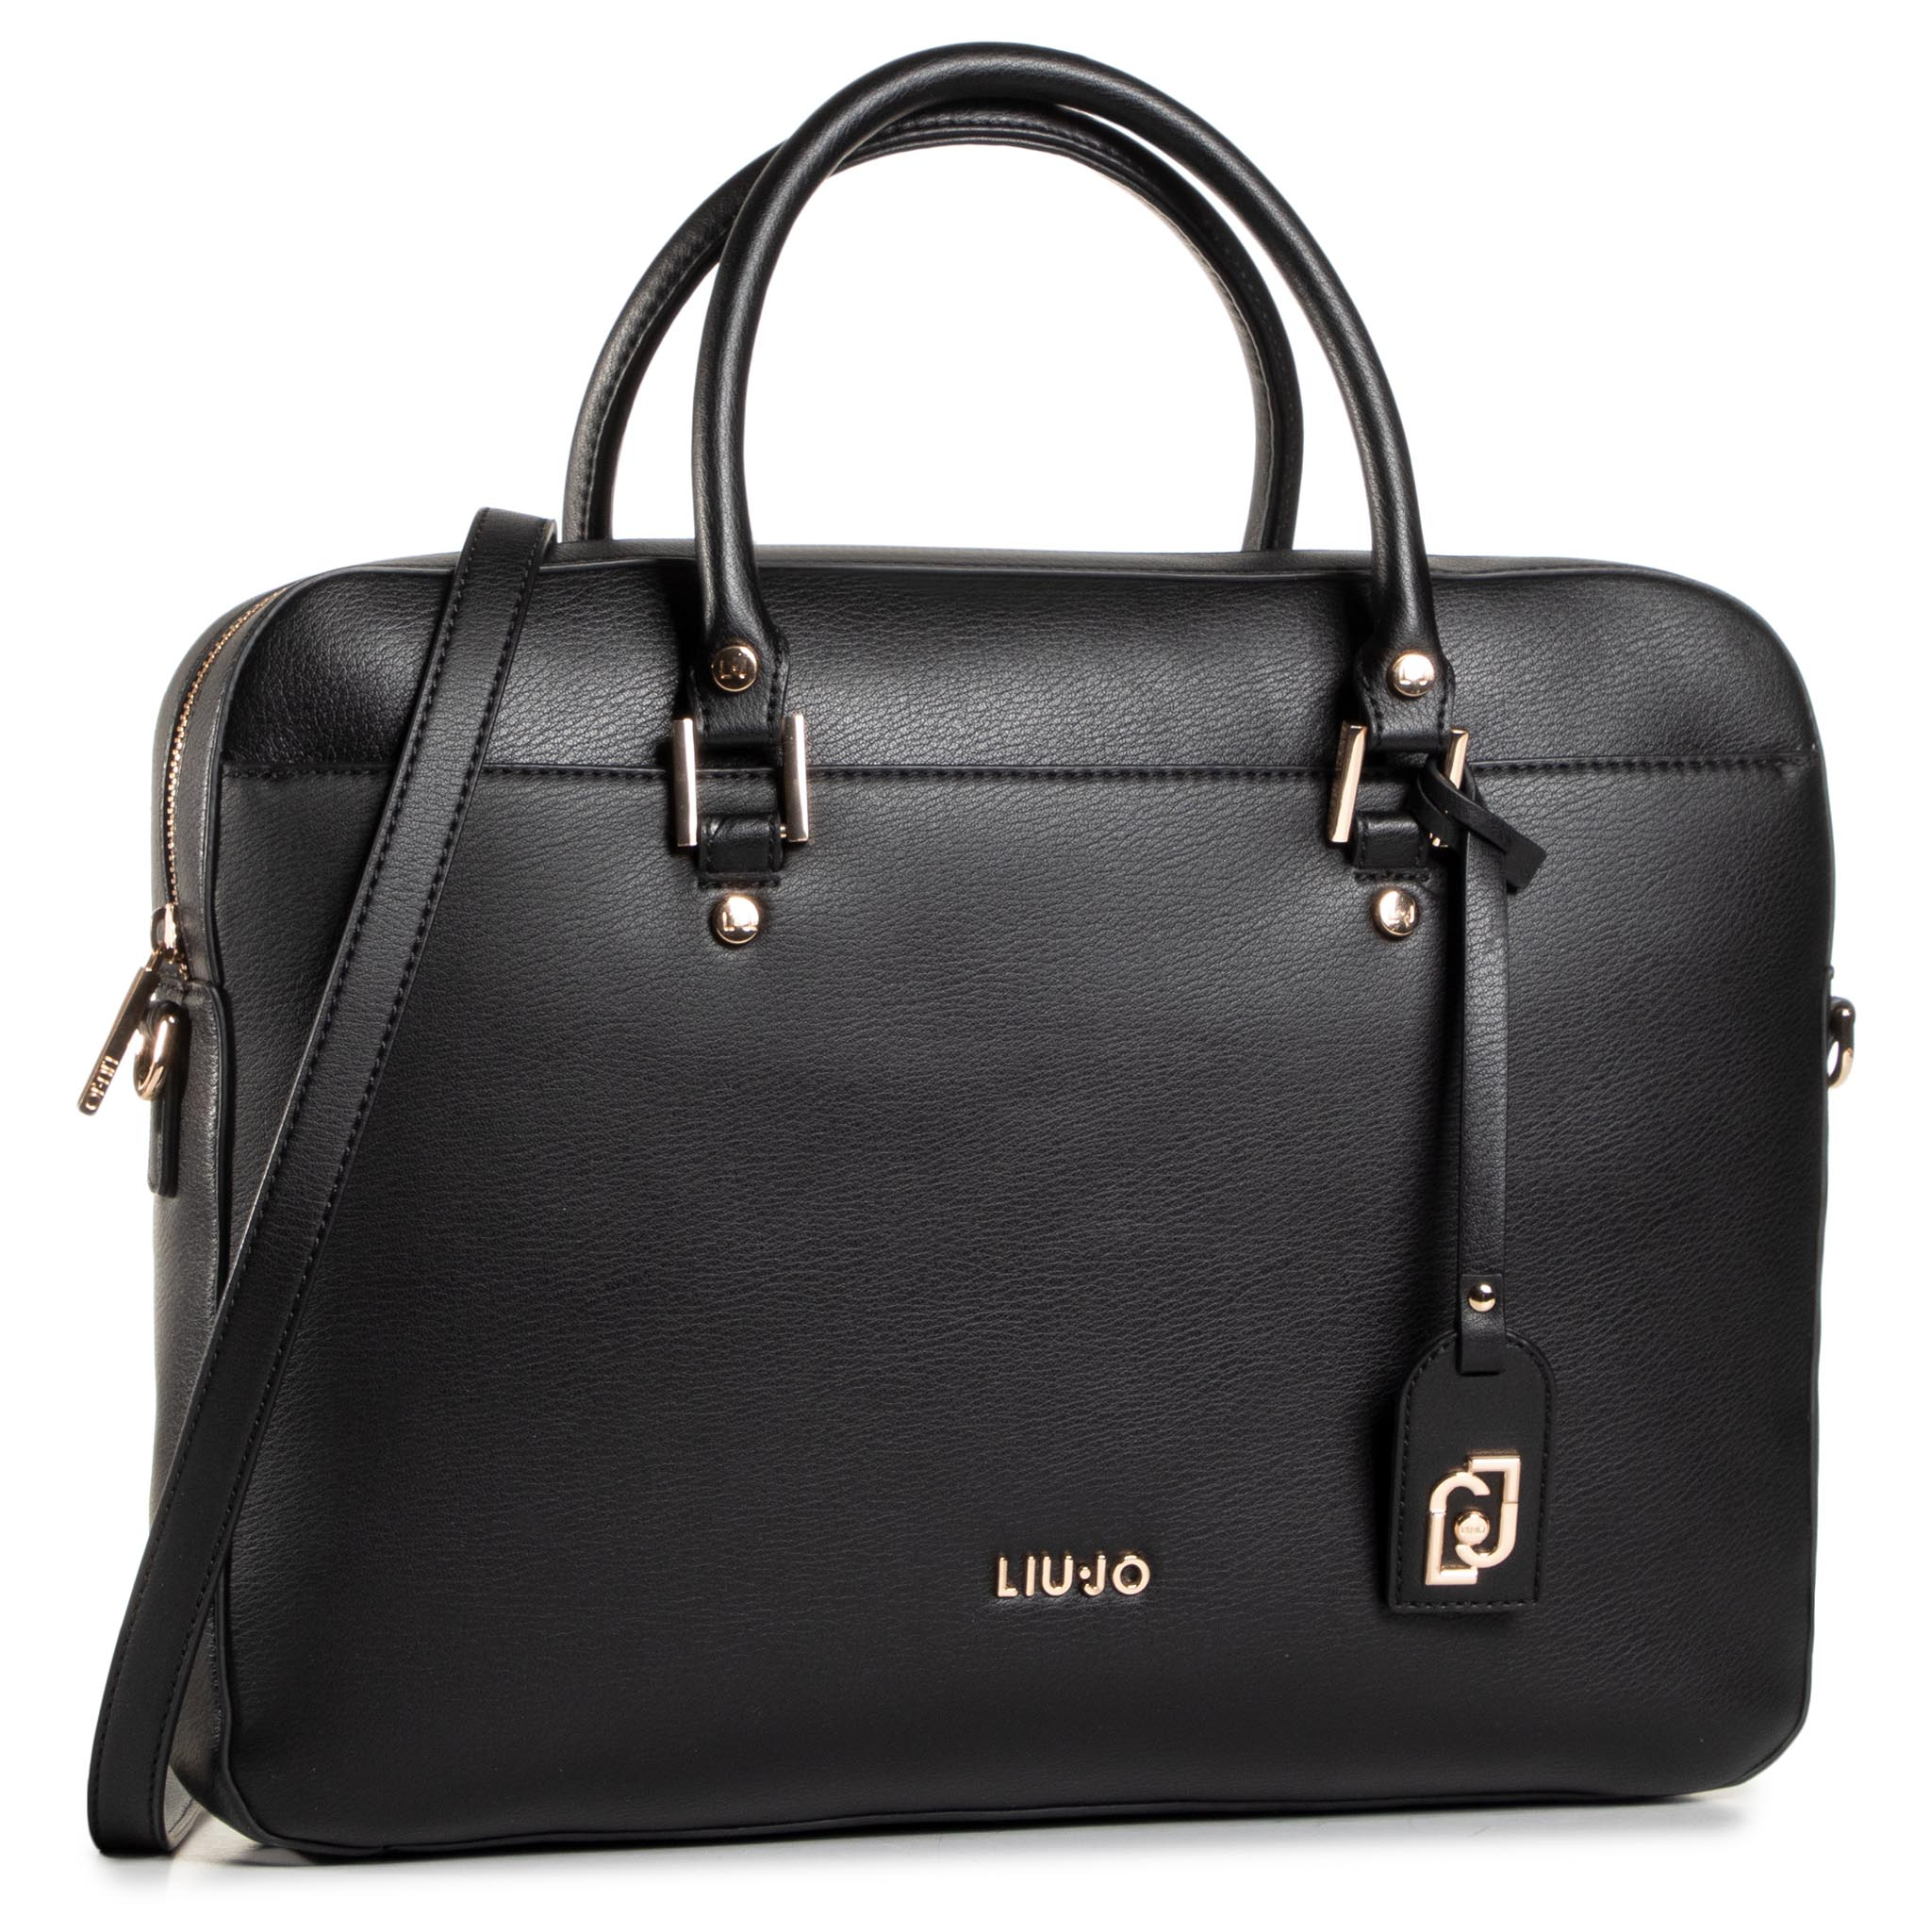 Image of Aktenmappe LIU JO - Briefcase AF0215 E0087 Nero 22222